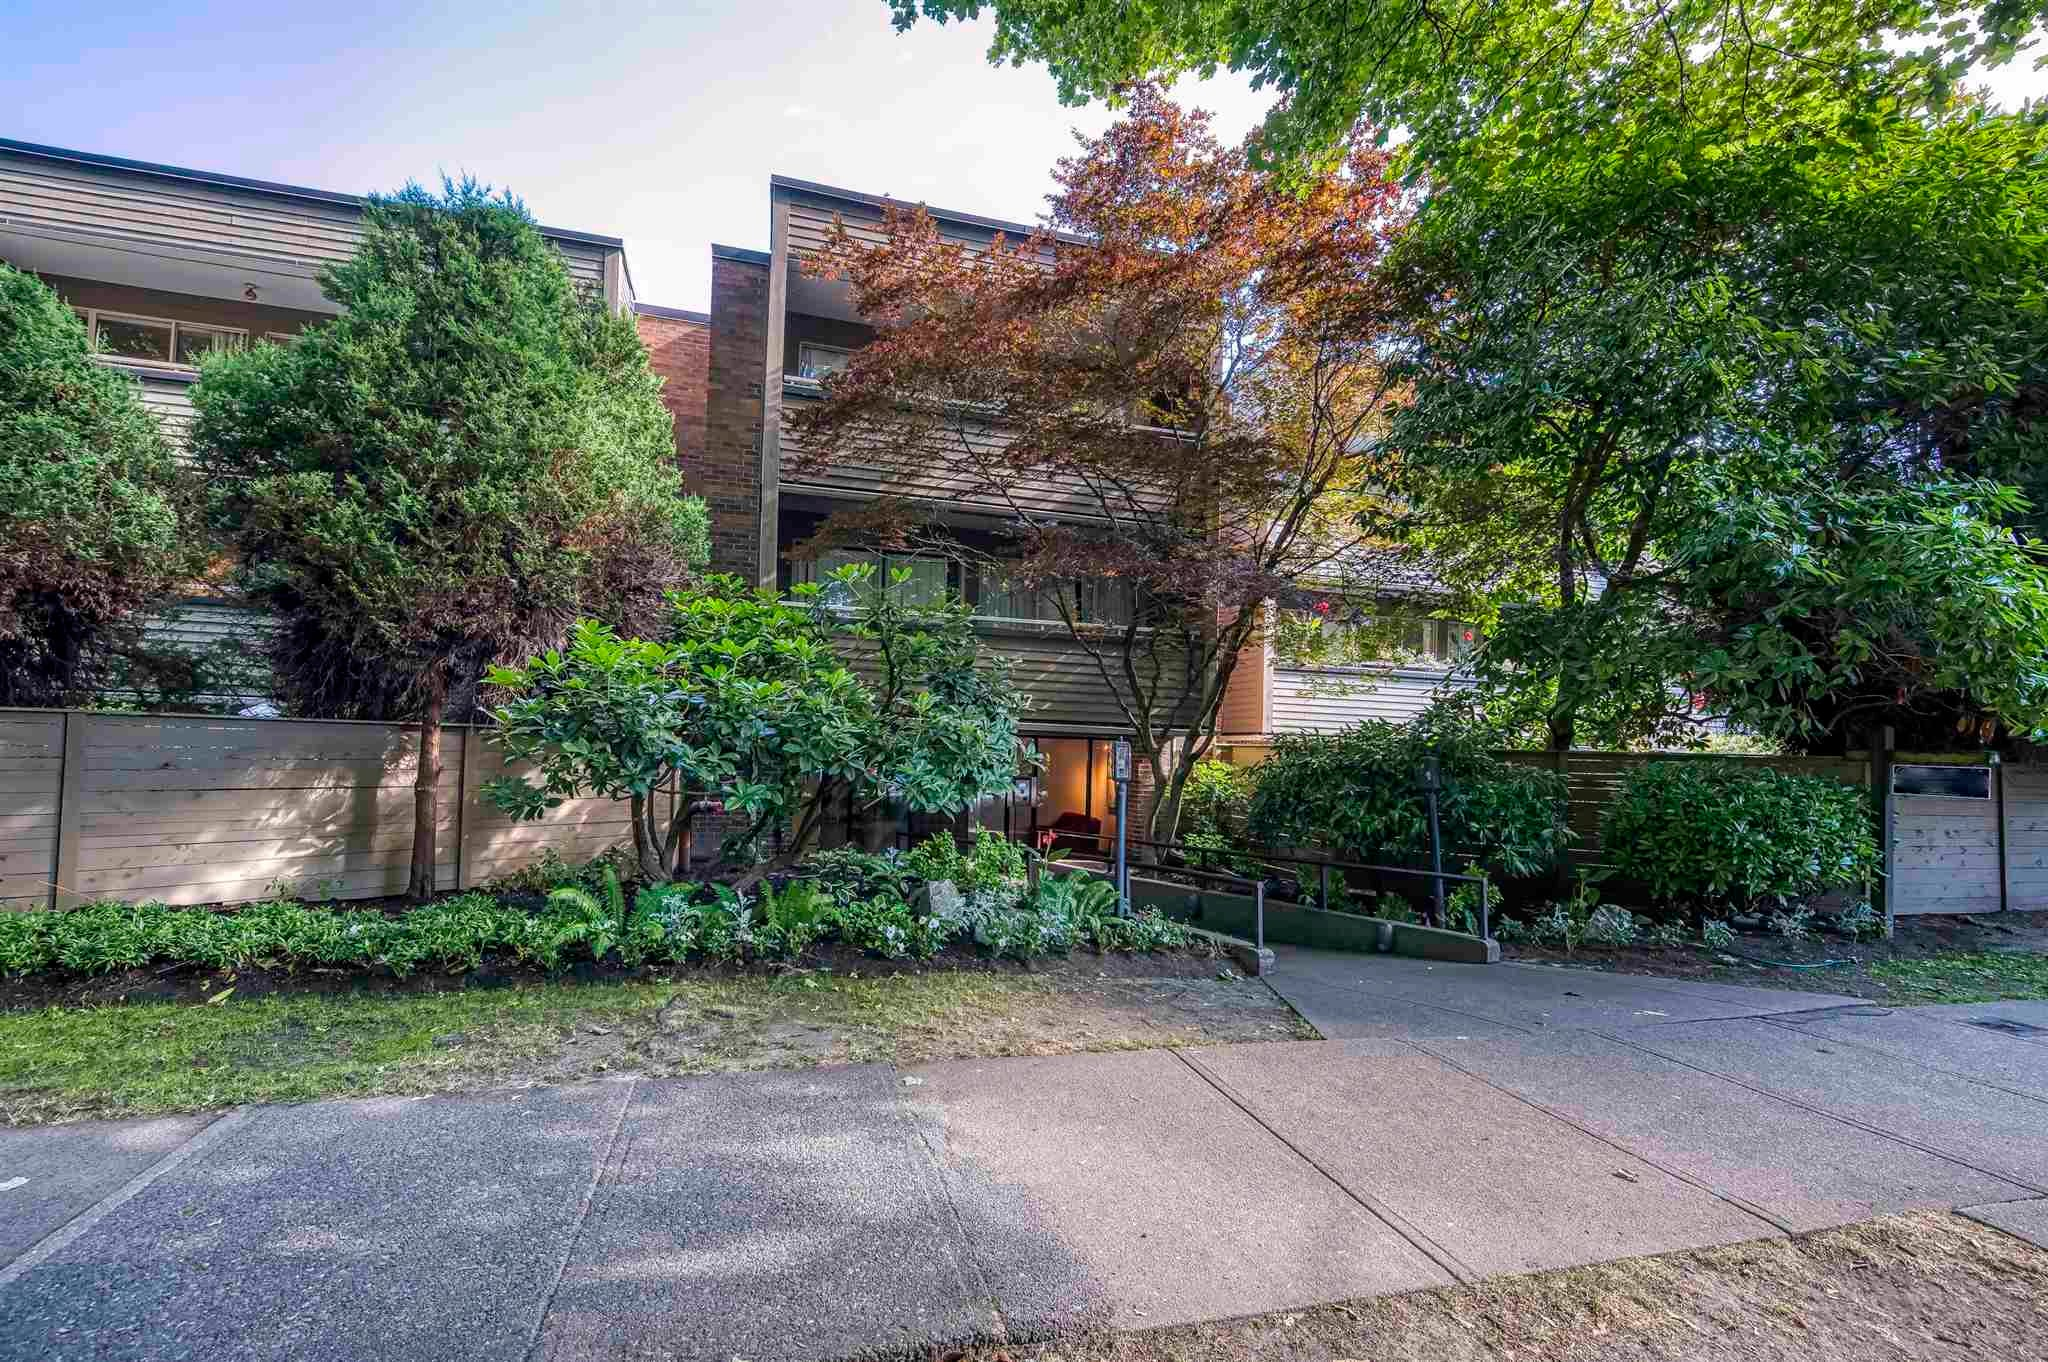 214 1777 W 13TH AVENUE - Fairview VW Apartment/Condo for sale, 1 Bedroom (R2605717)